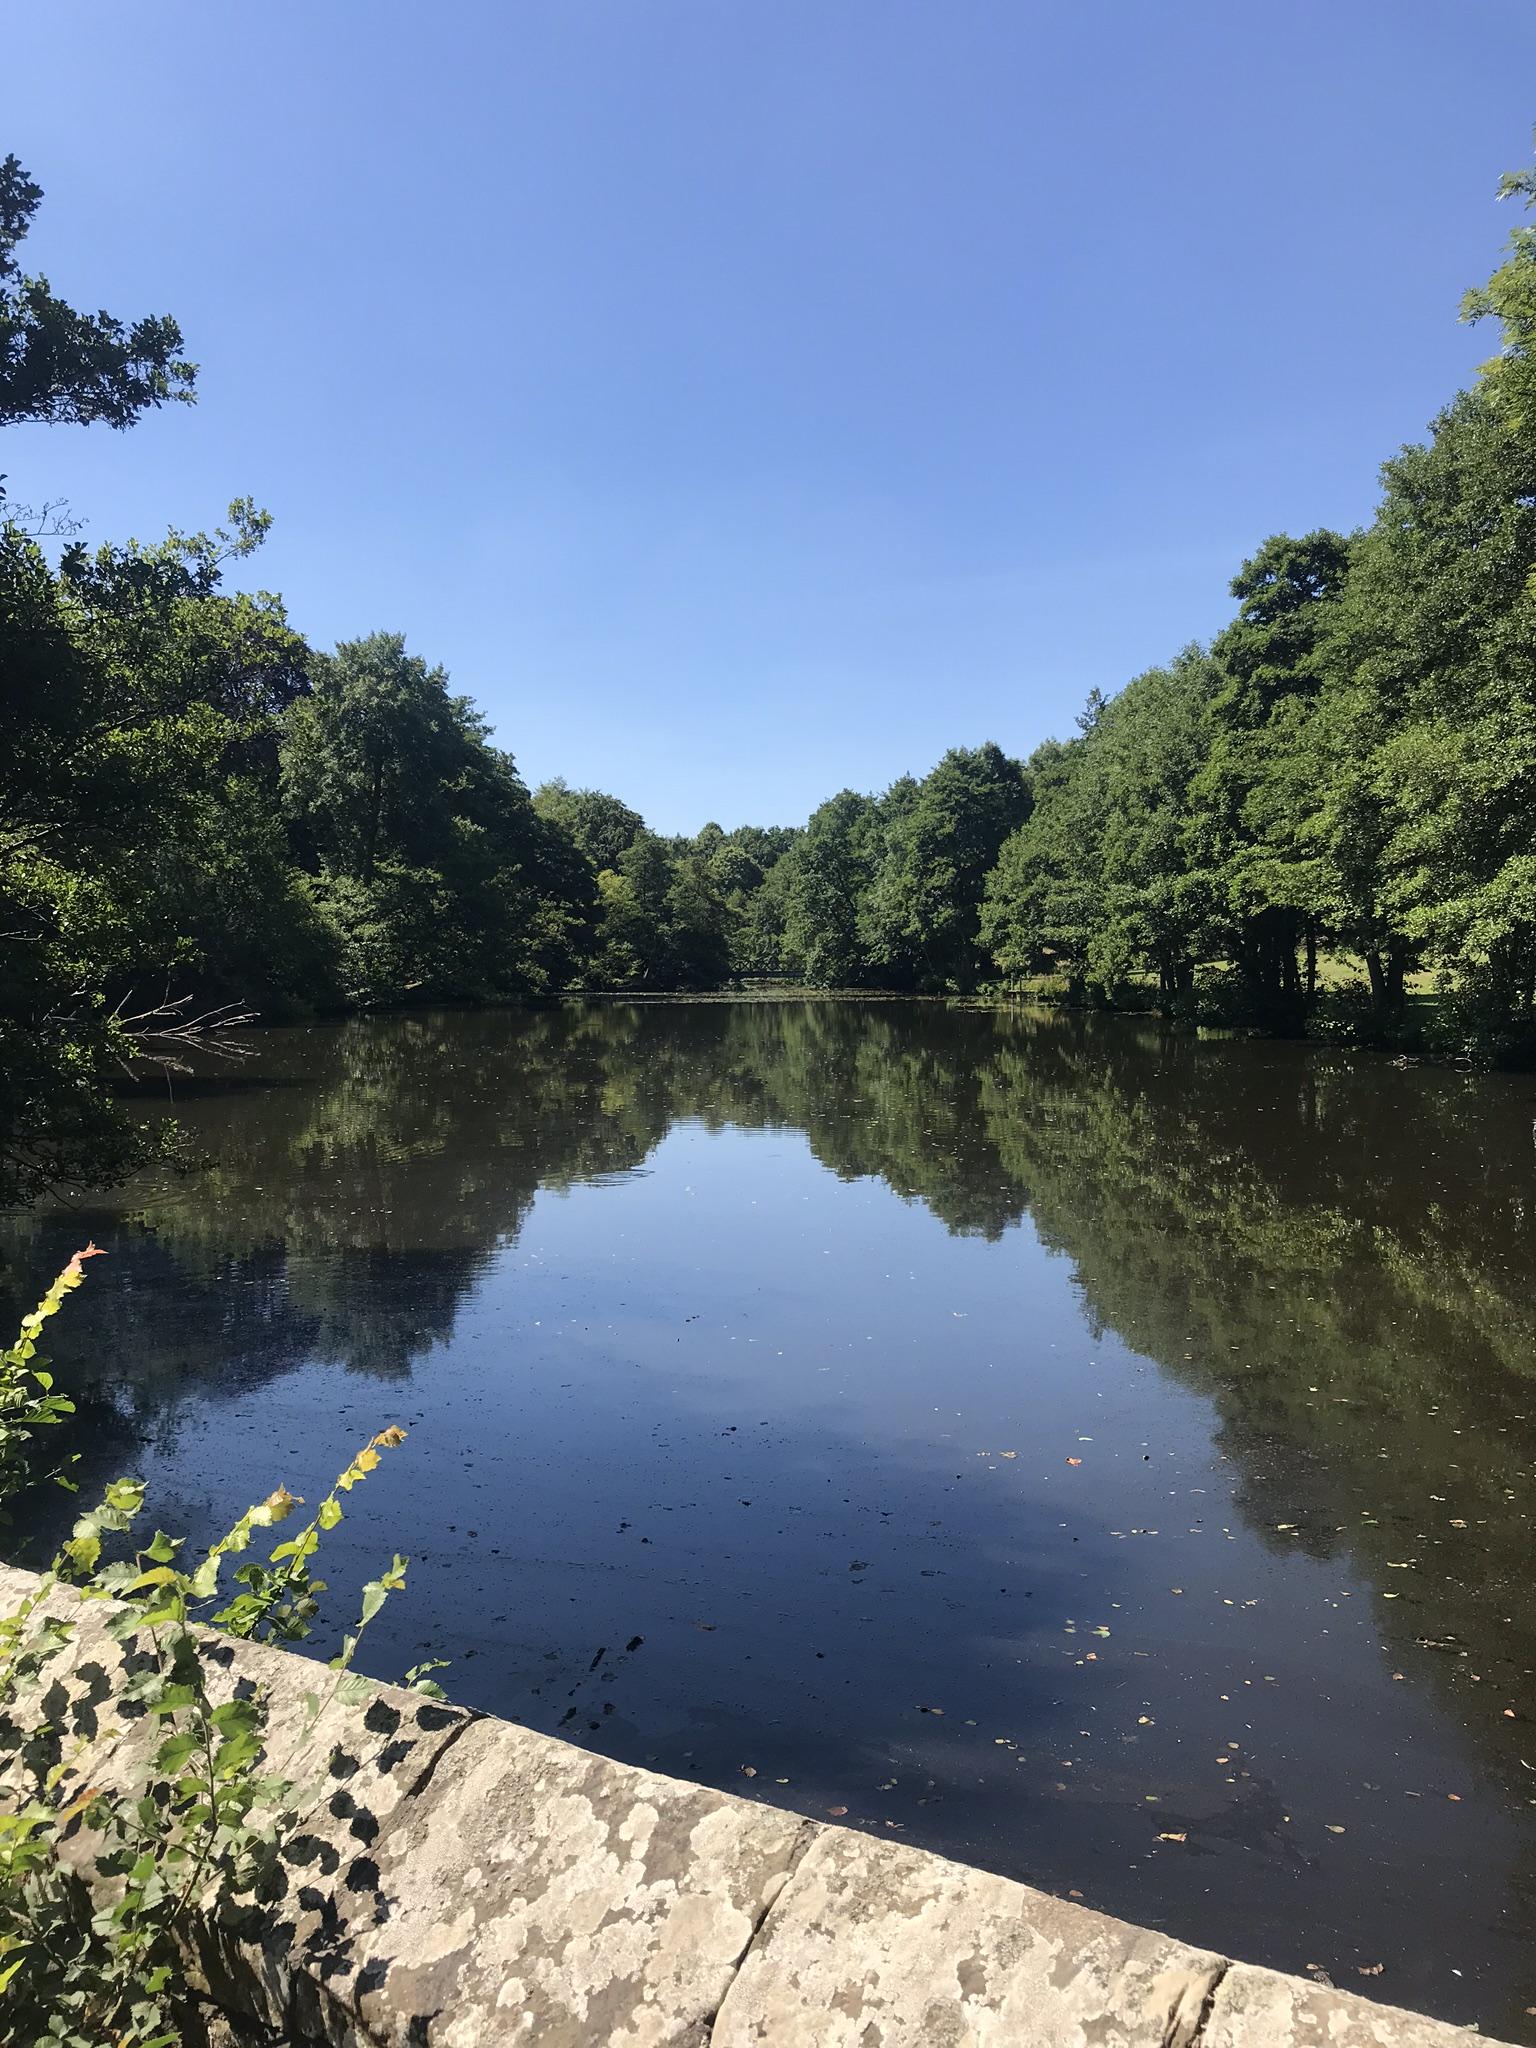 Image of lake at Chiddingstone Castle